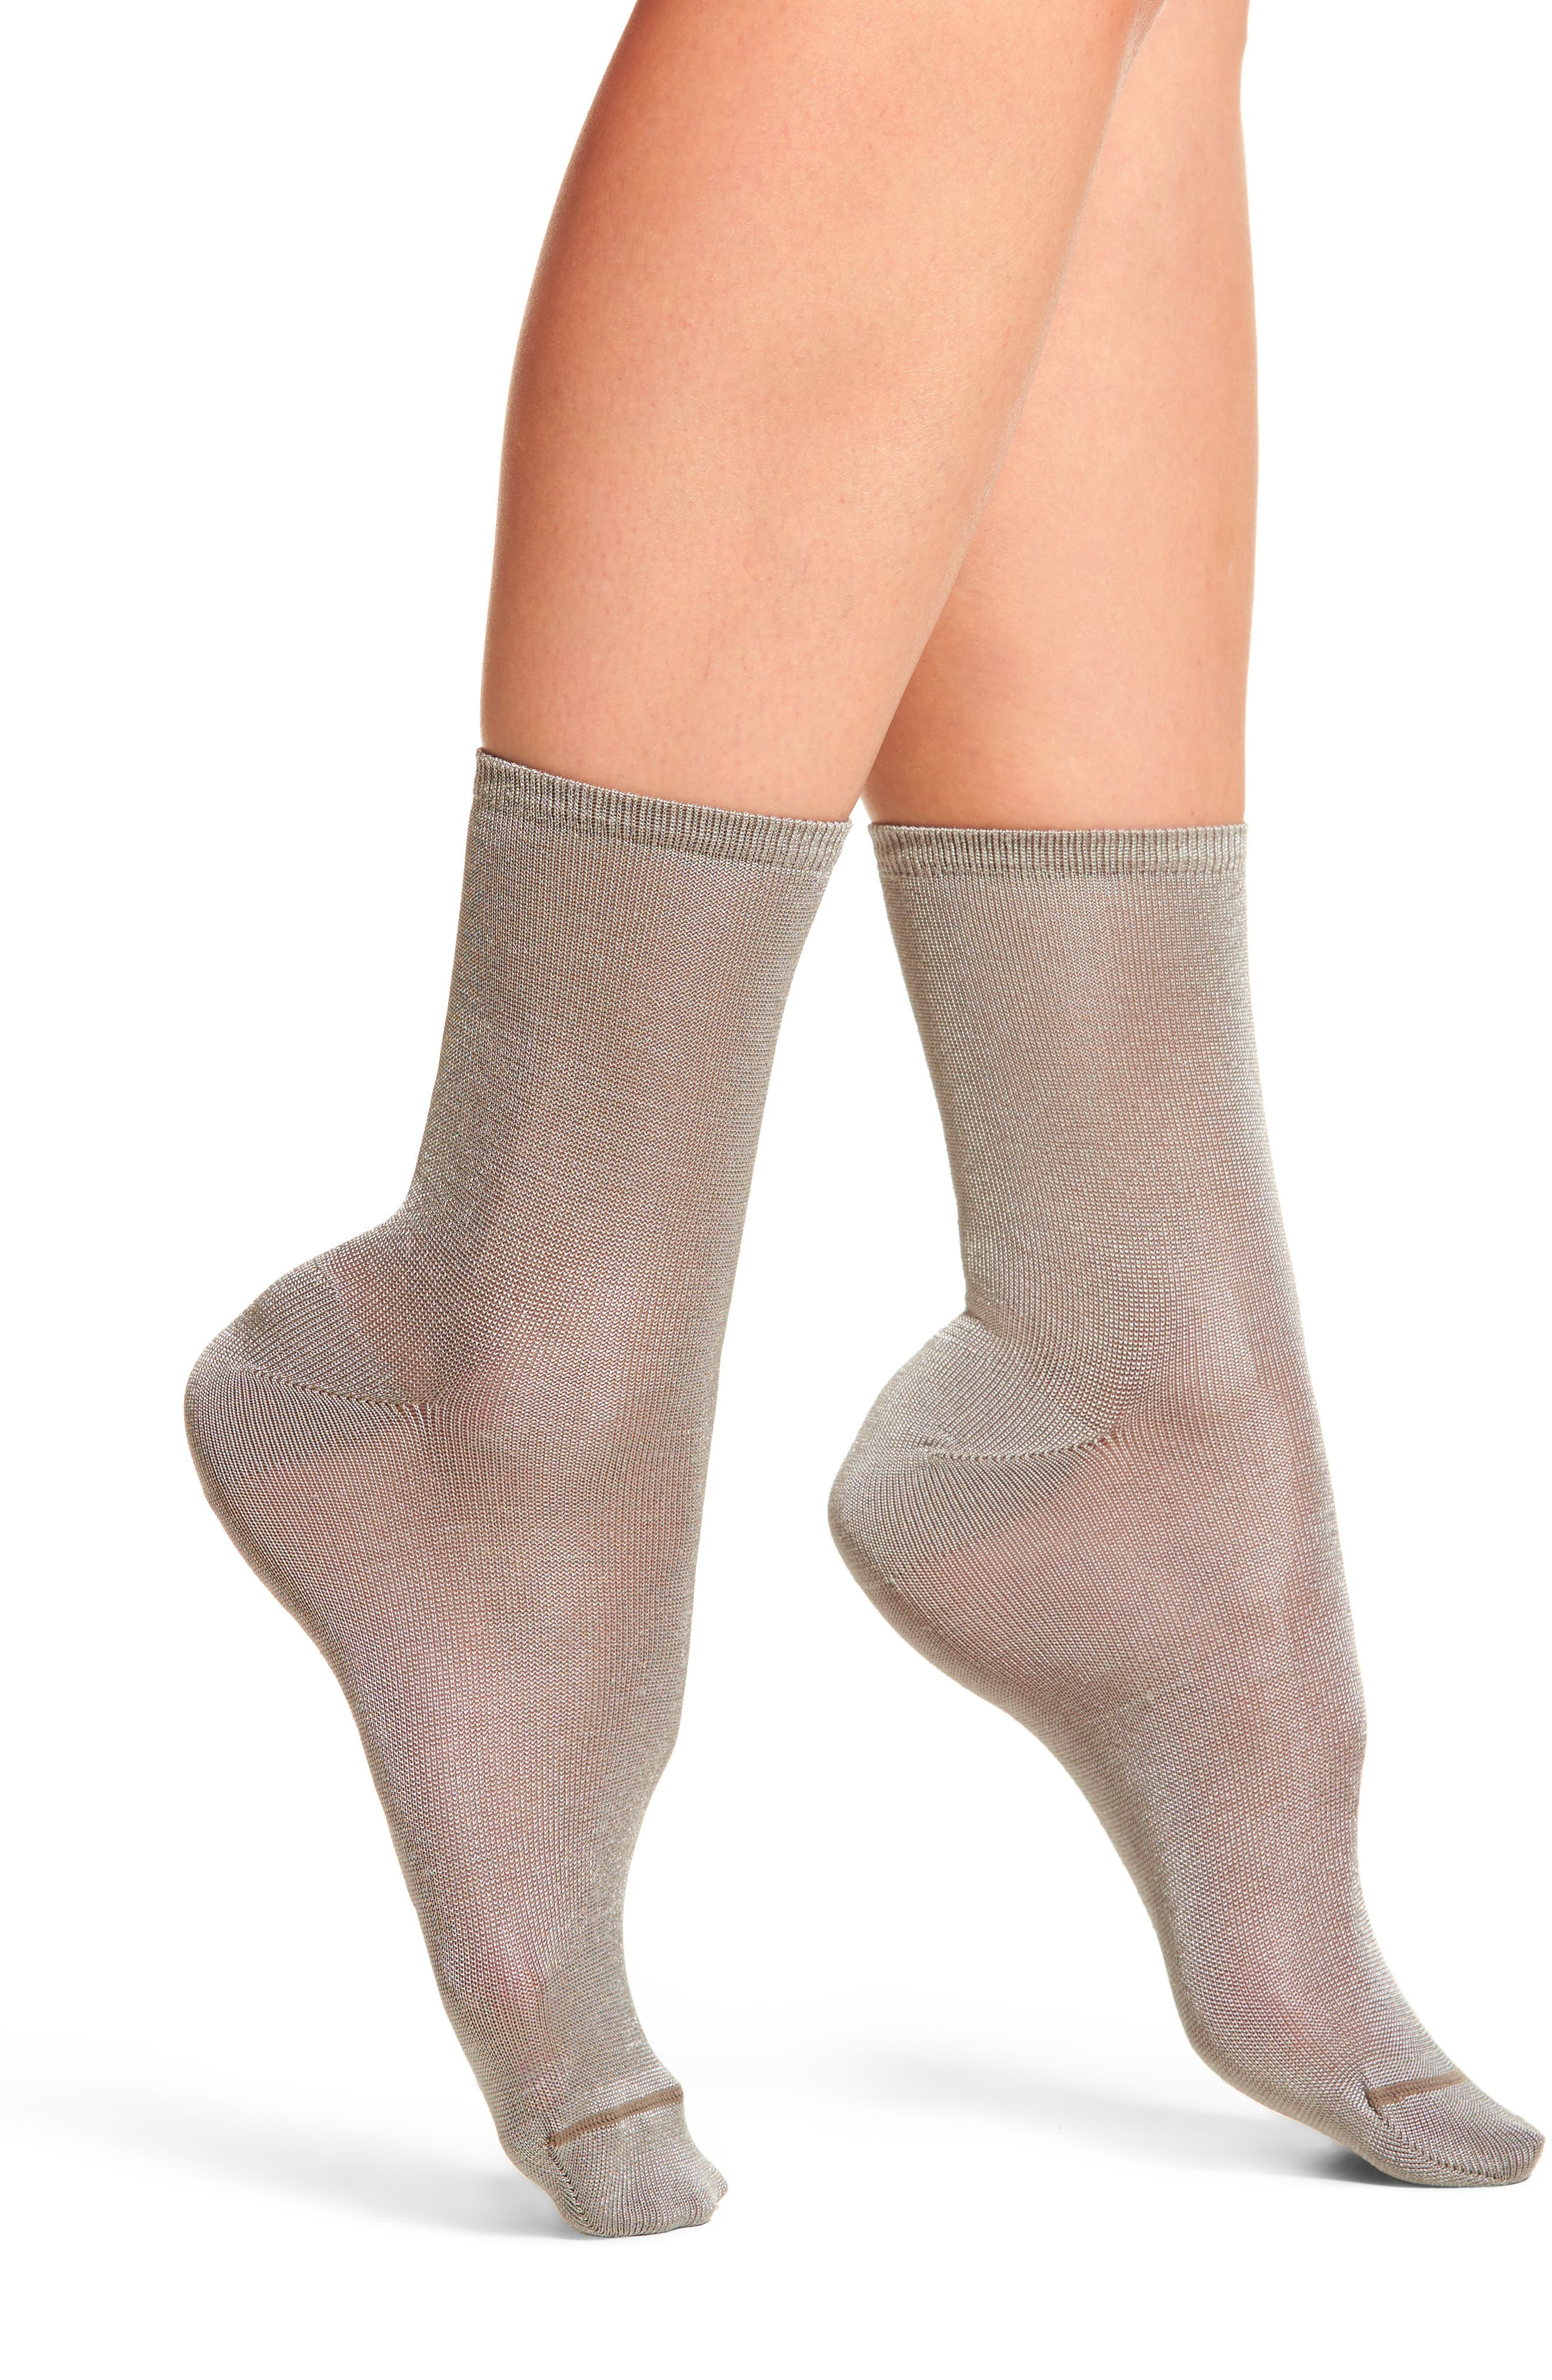 Sweetly Sheer Ankle Socks,                             Main thumbnail 1, color,                             020